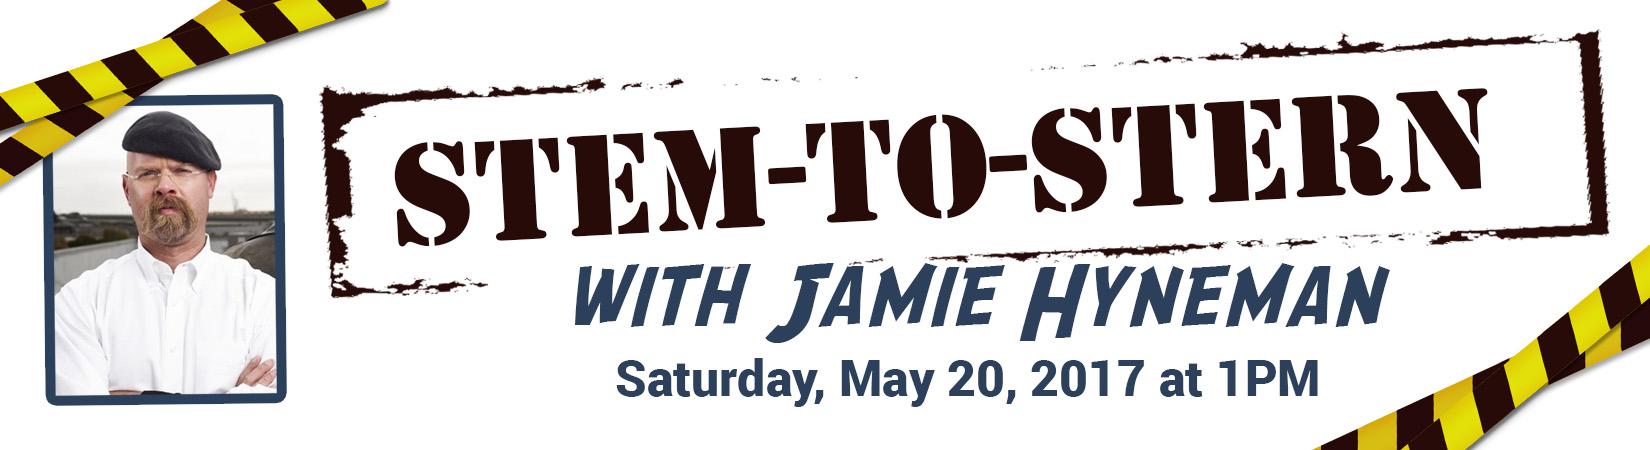 2017-STEM-to-Stern with Jaime Hyneman-Event Banner